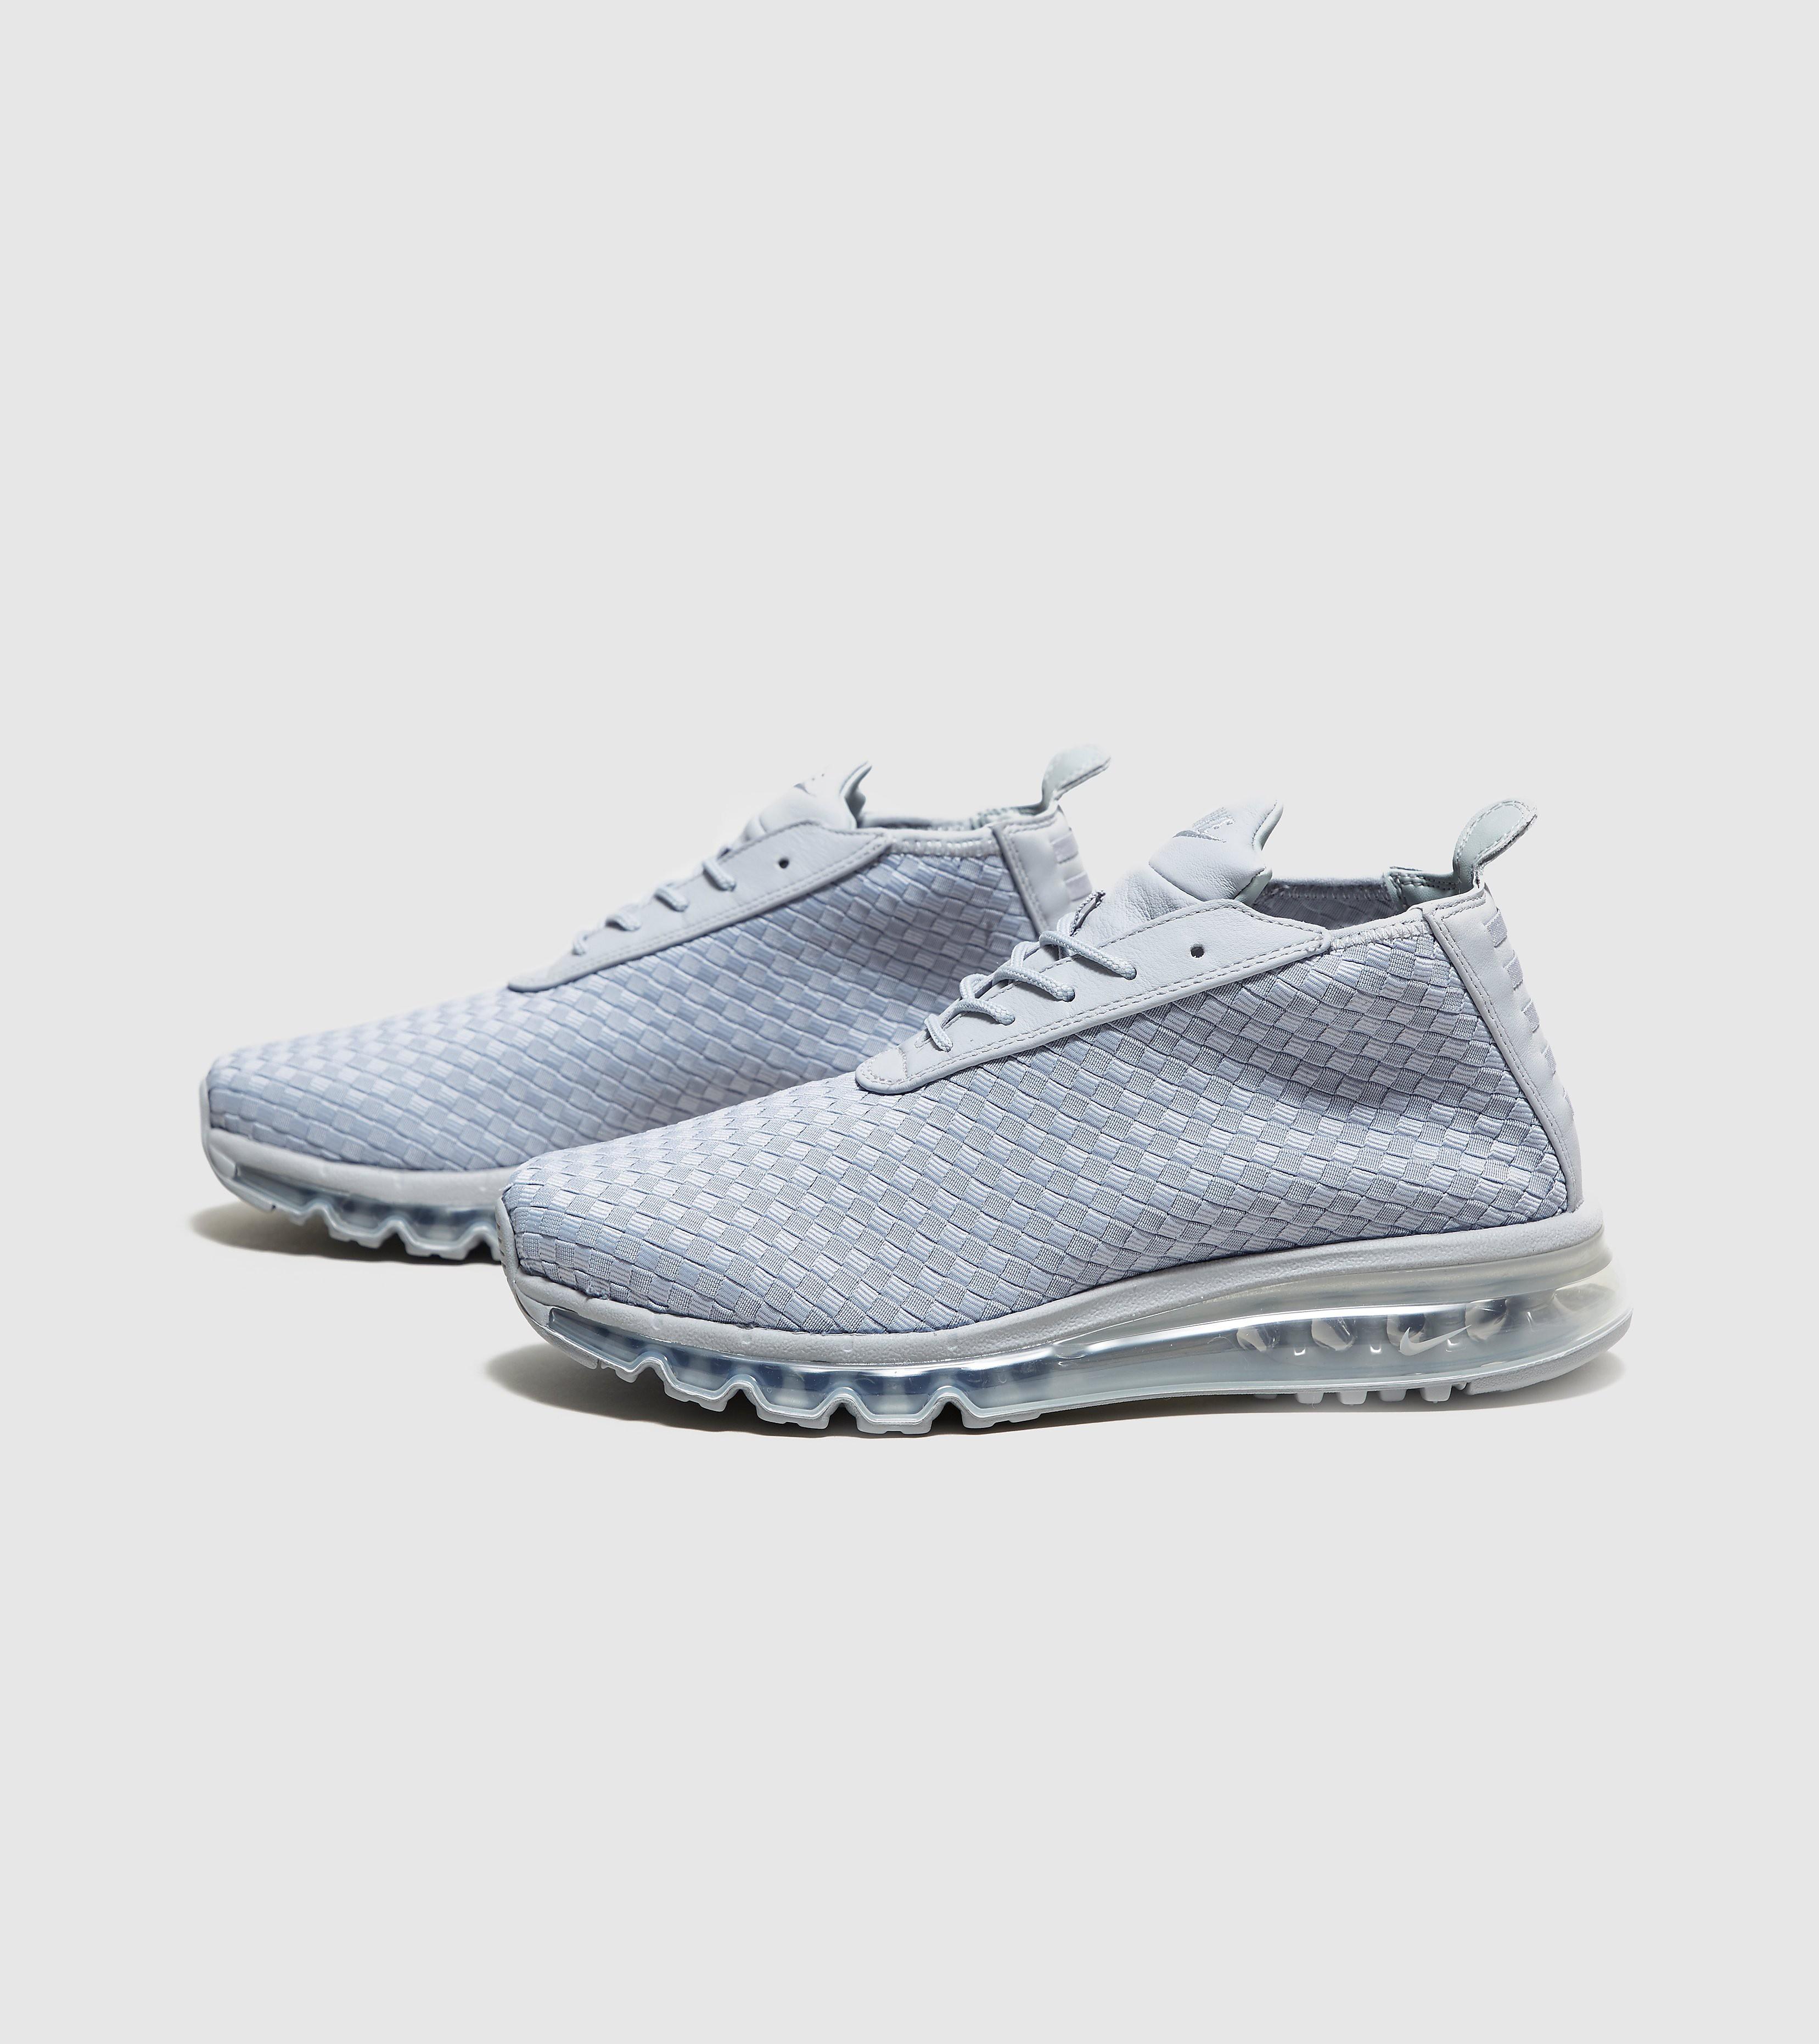 Nike Air Max 360 Woven Boot